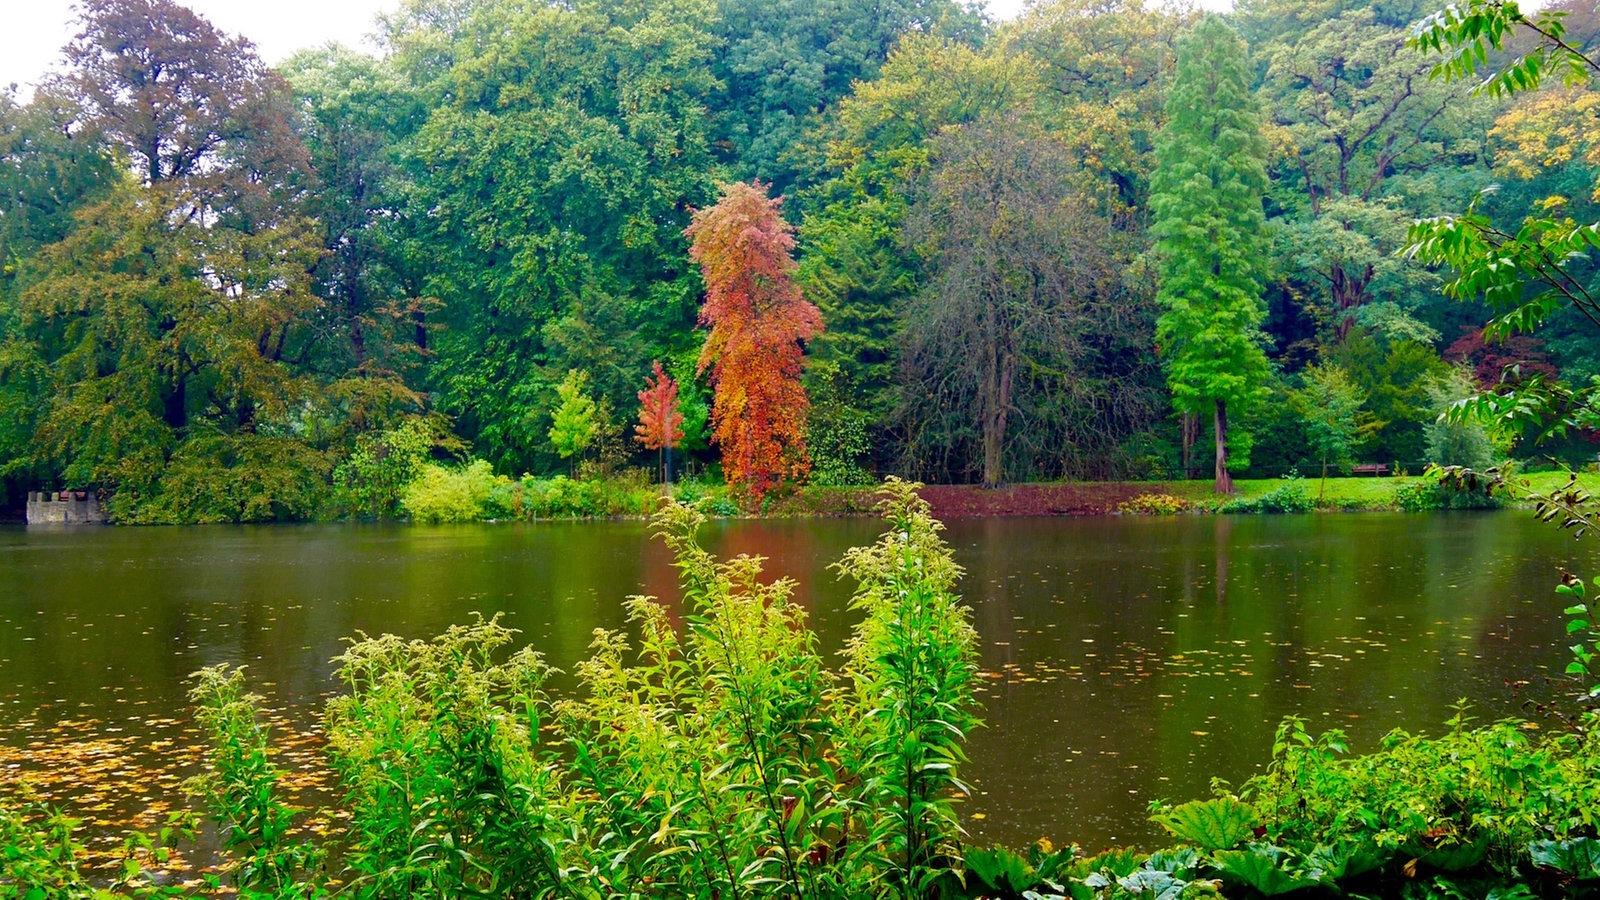 Botanischer garten rombergpark in dortmund spaziergang for Garten 4 bilder 1 wort